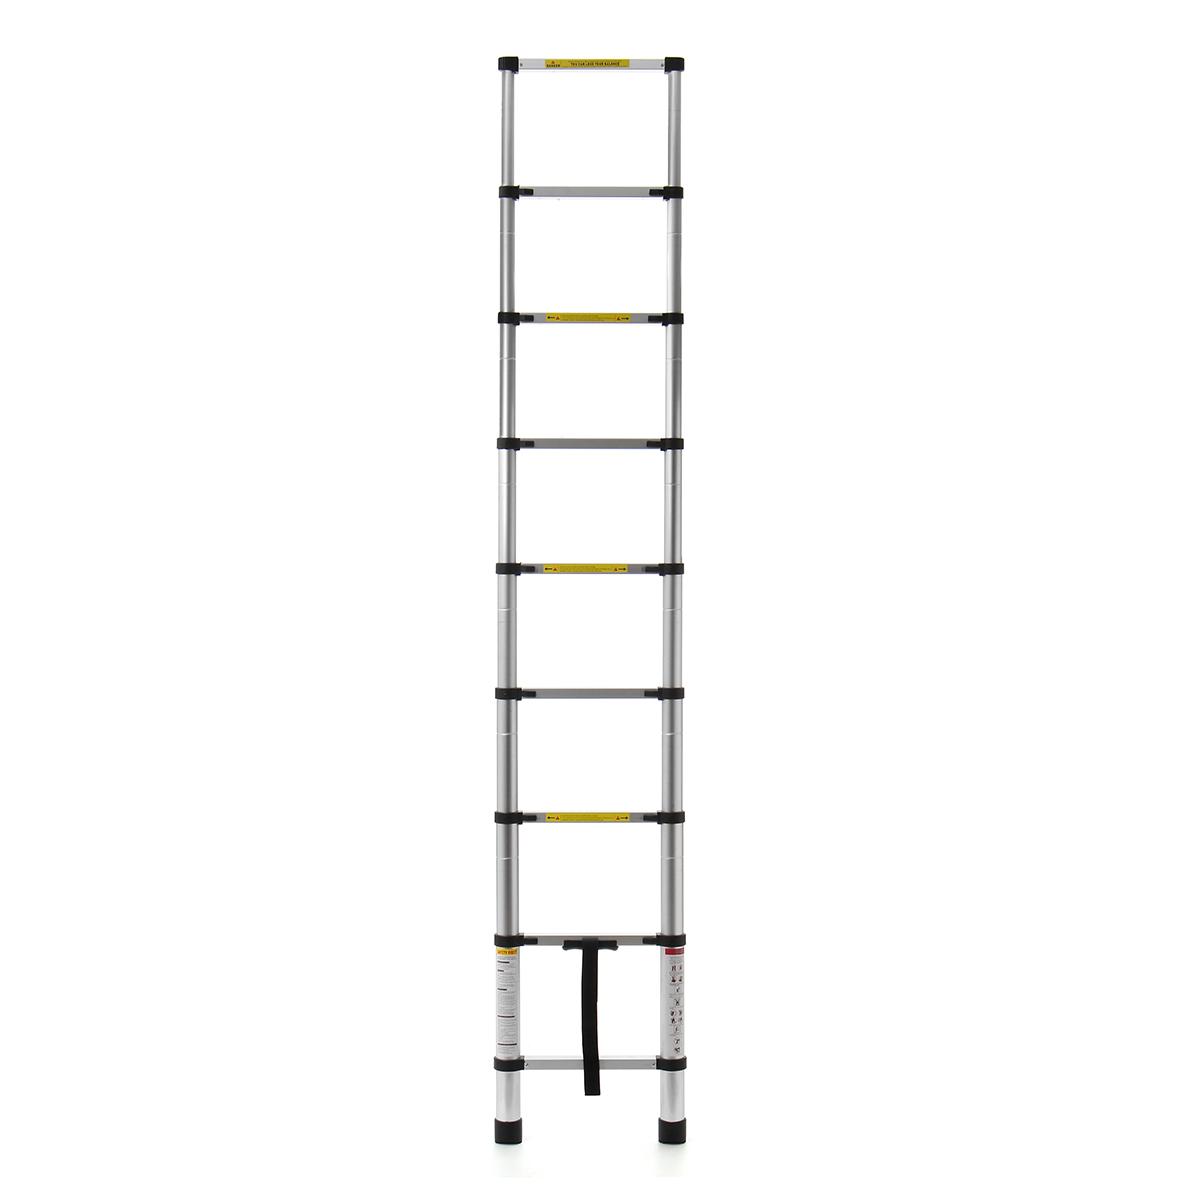 2.6 m telescopic ladder skil heat gun